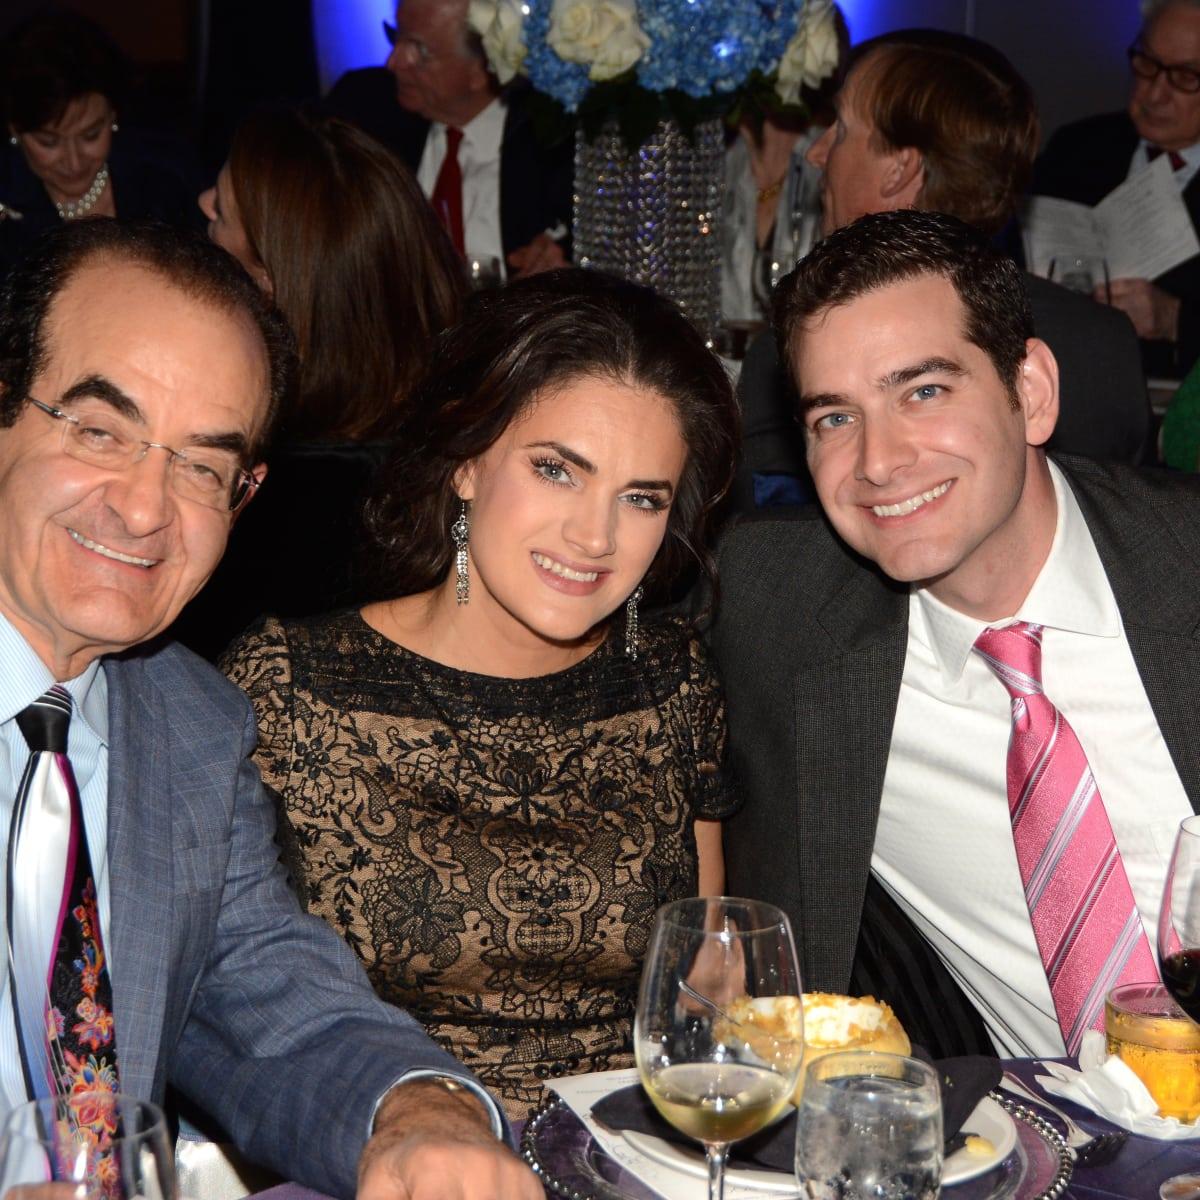 News, Houston Treasures, Dec. 2015, Nino Shbeeb, Danielle Shbeeb, Sami Shbeeb